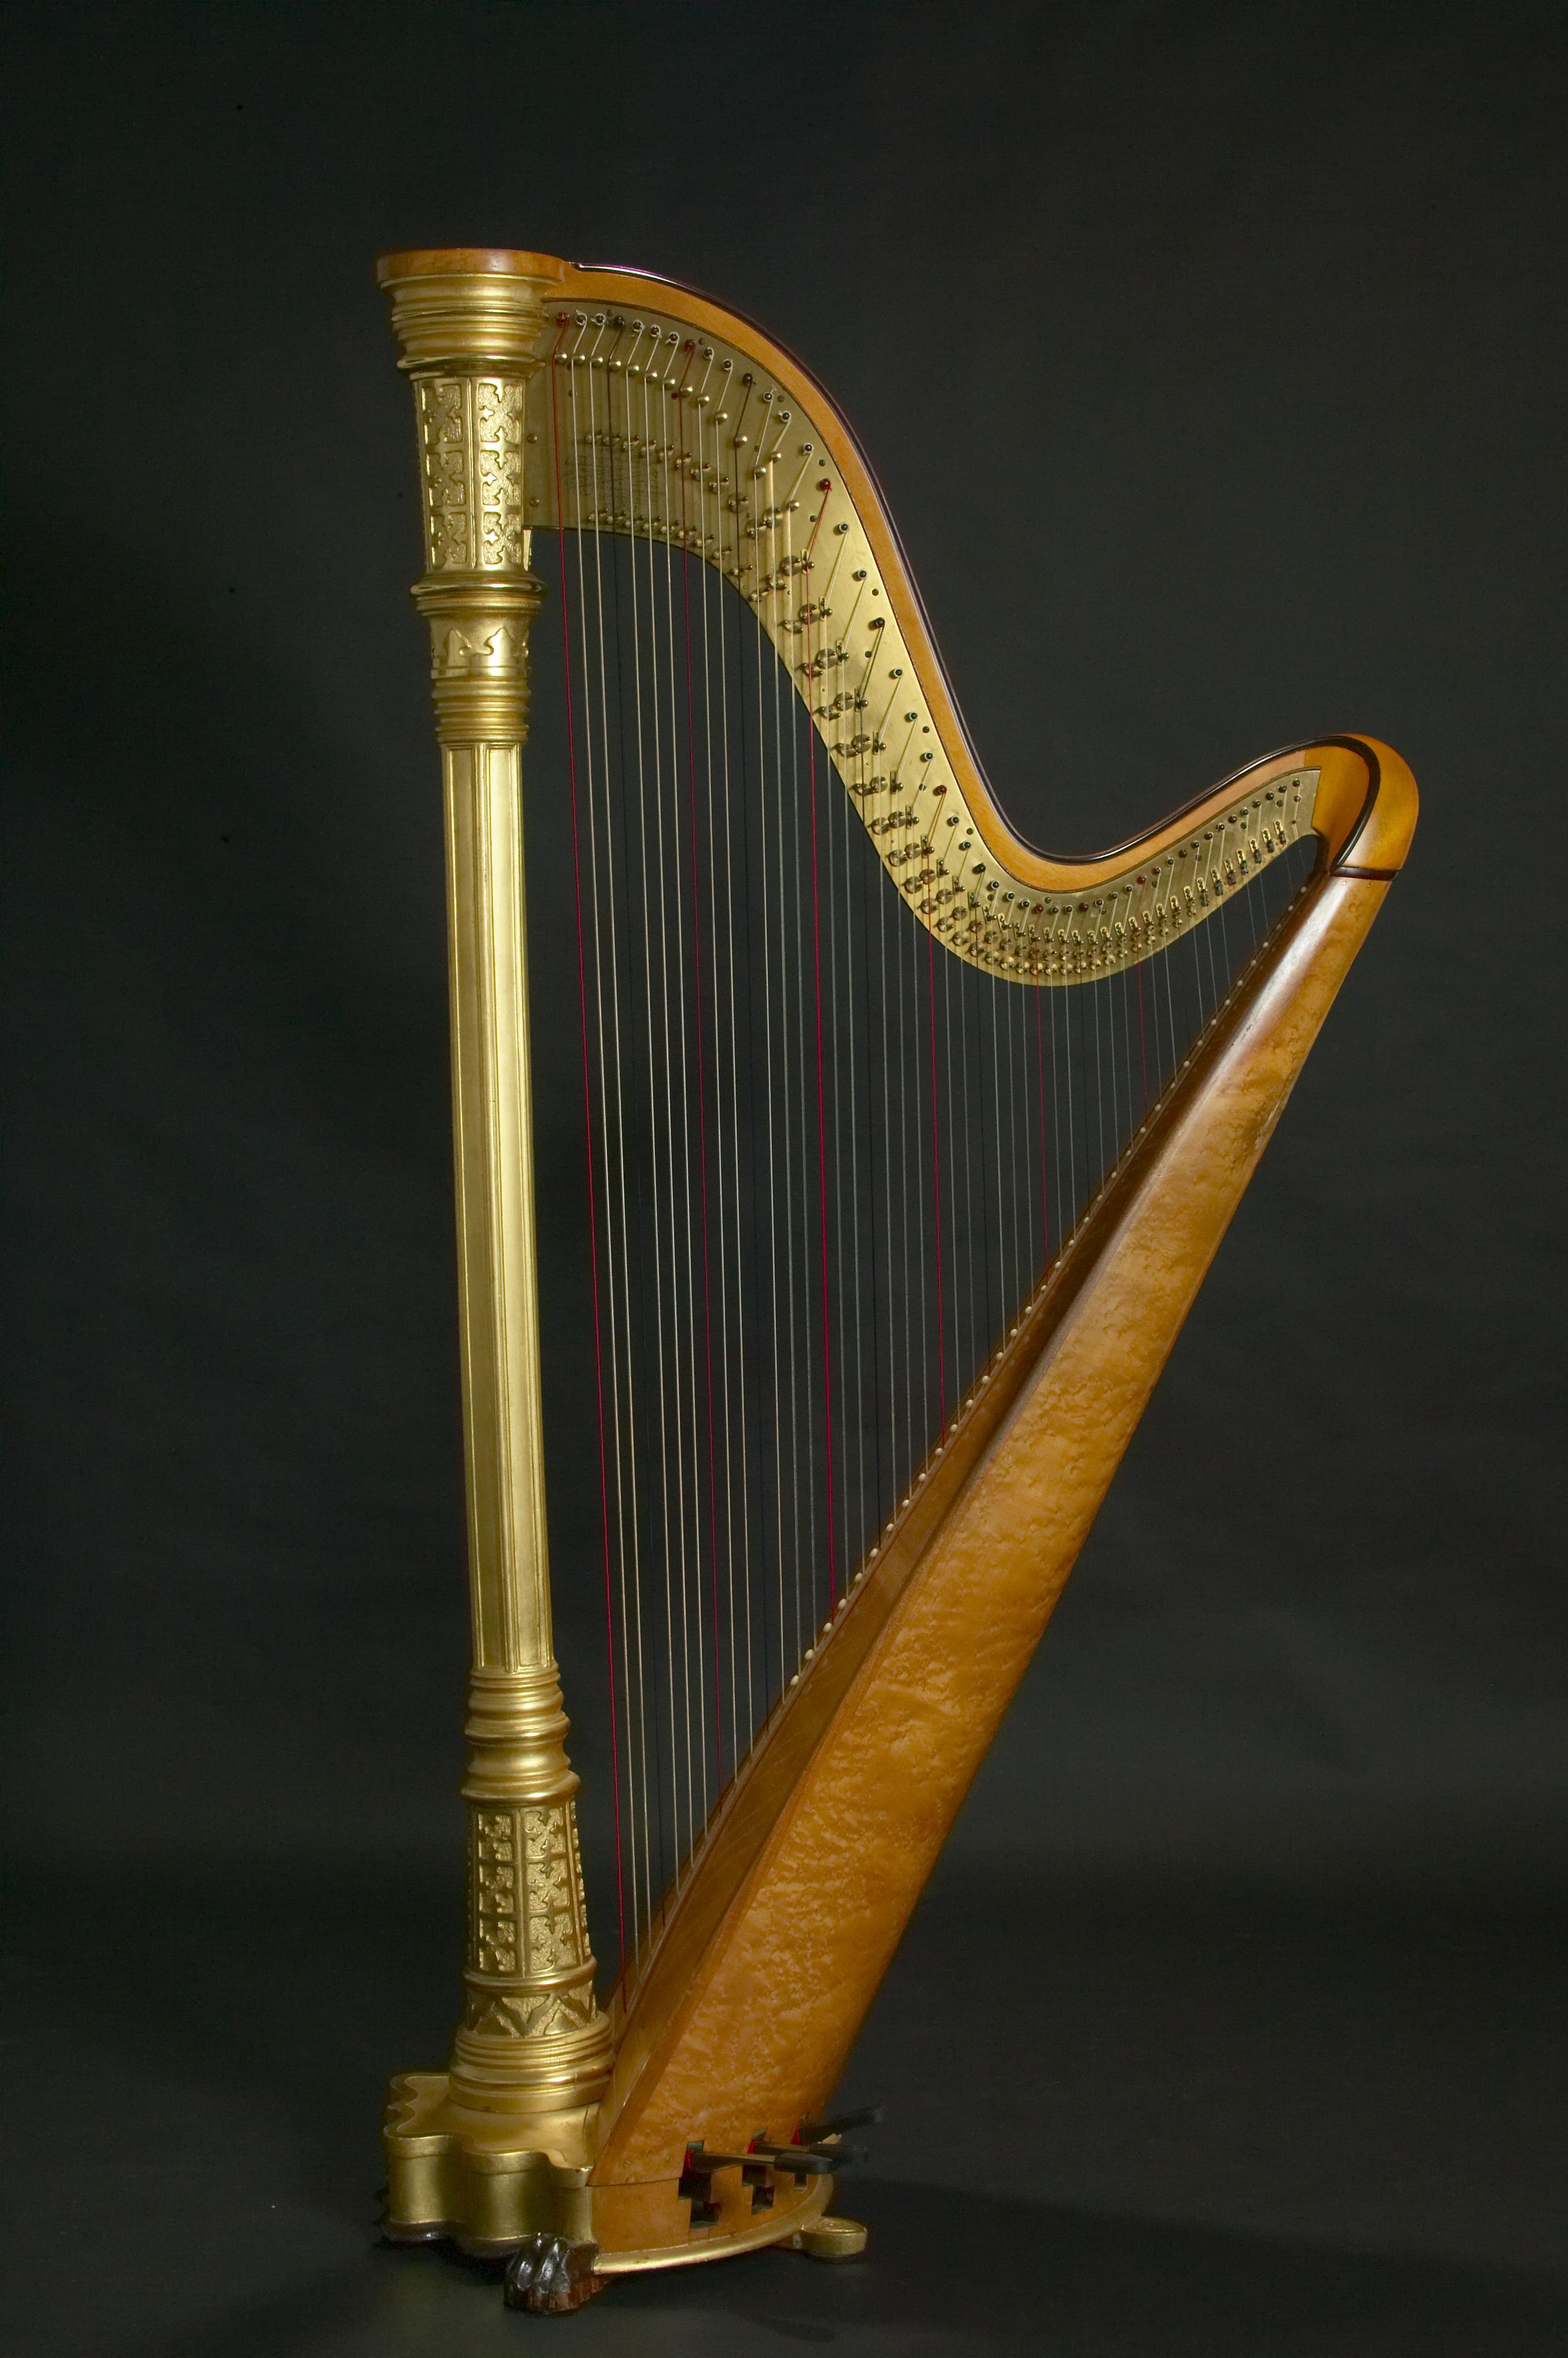 Best 59 Harp Background on HipWallpaper Sharp Wallpaper Harp 2708x4072